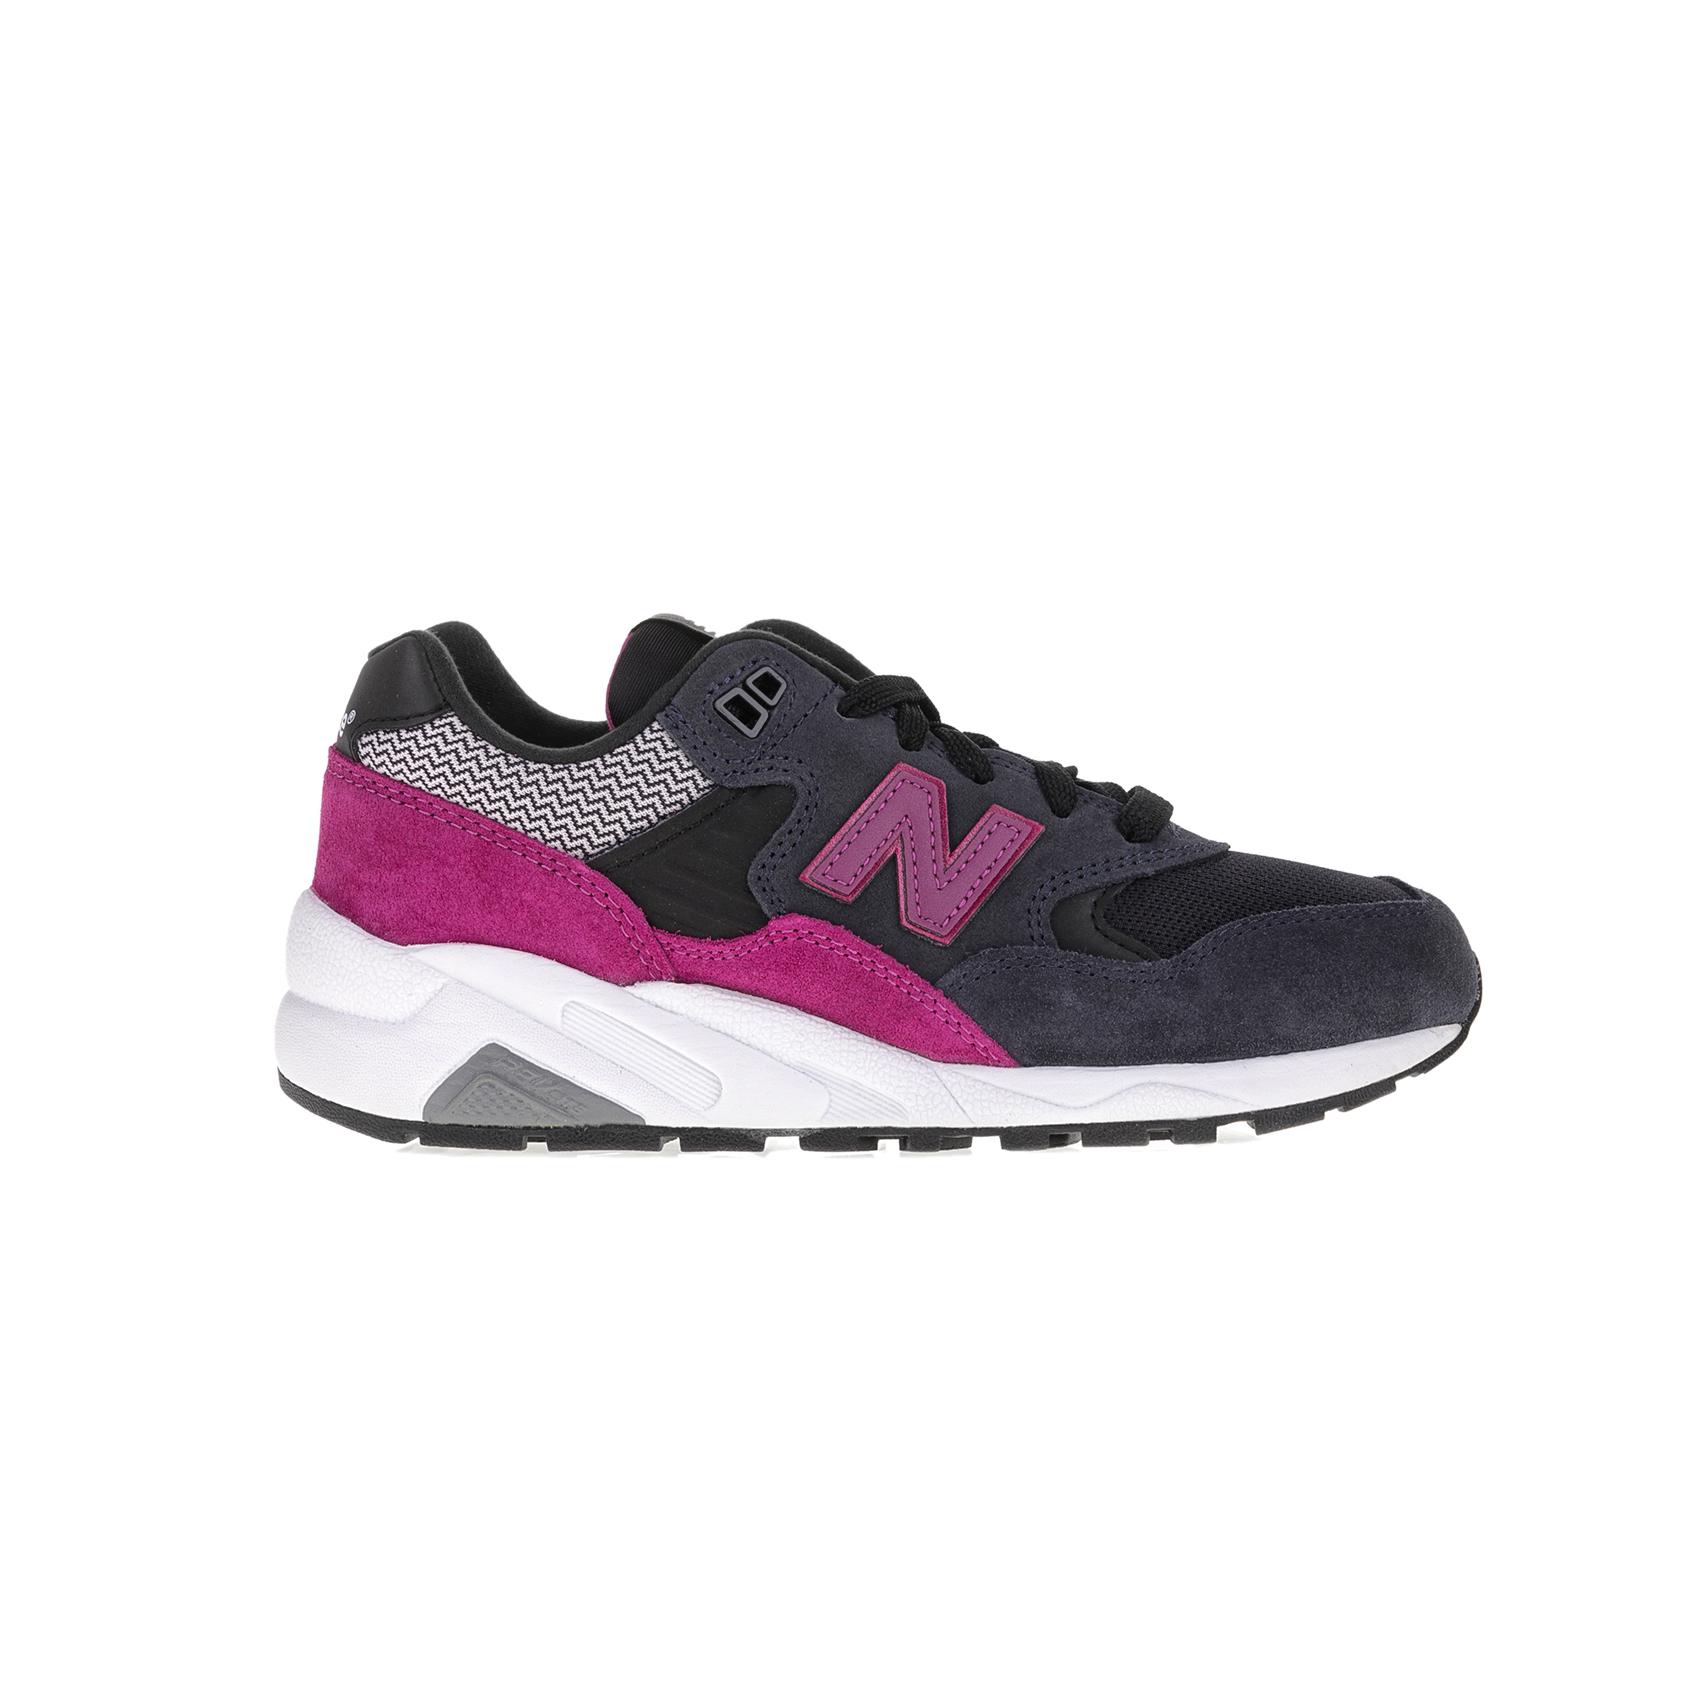 NEW BALANCE - Γυναικεία sneakers NEW BALANCE γκρι-μοβ γυναικεία παπούτσια sneakers